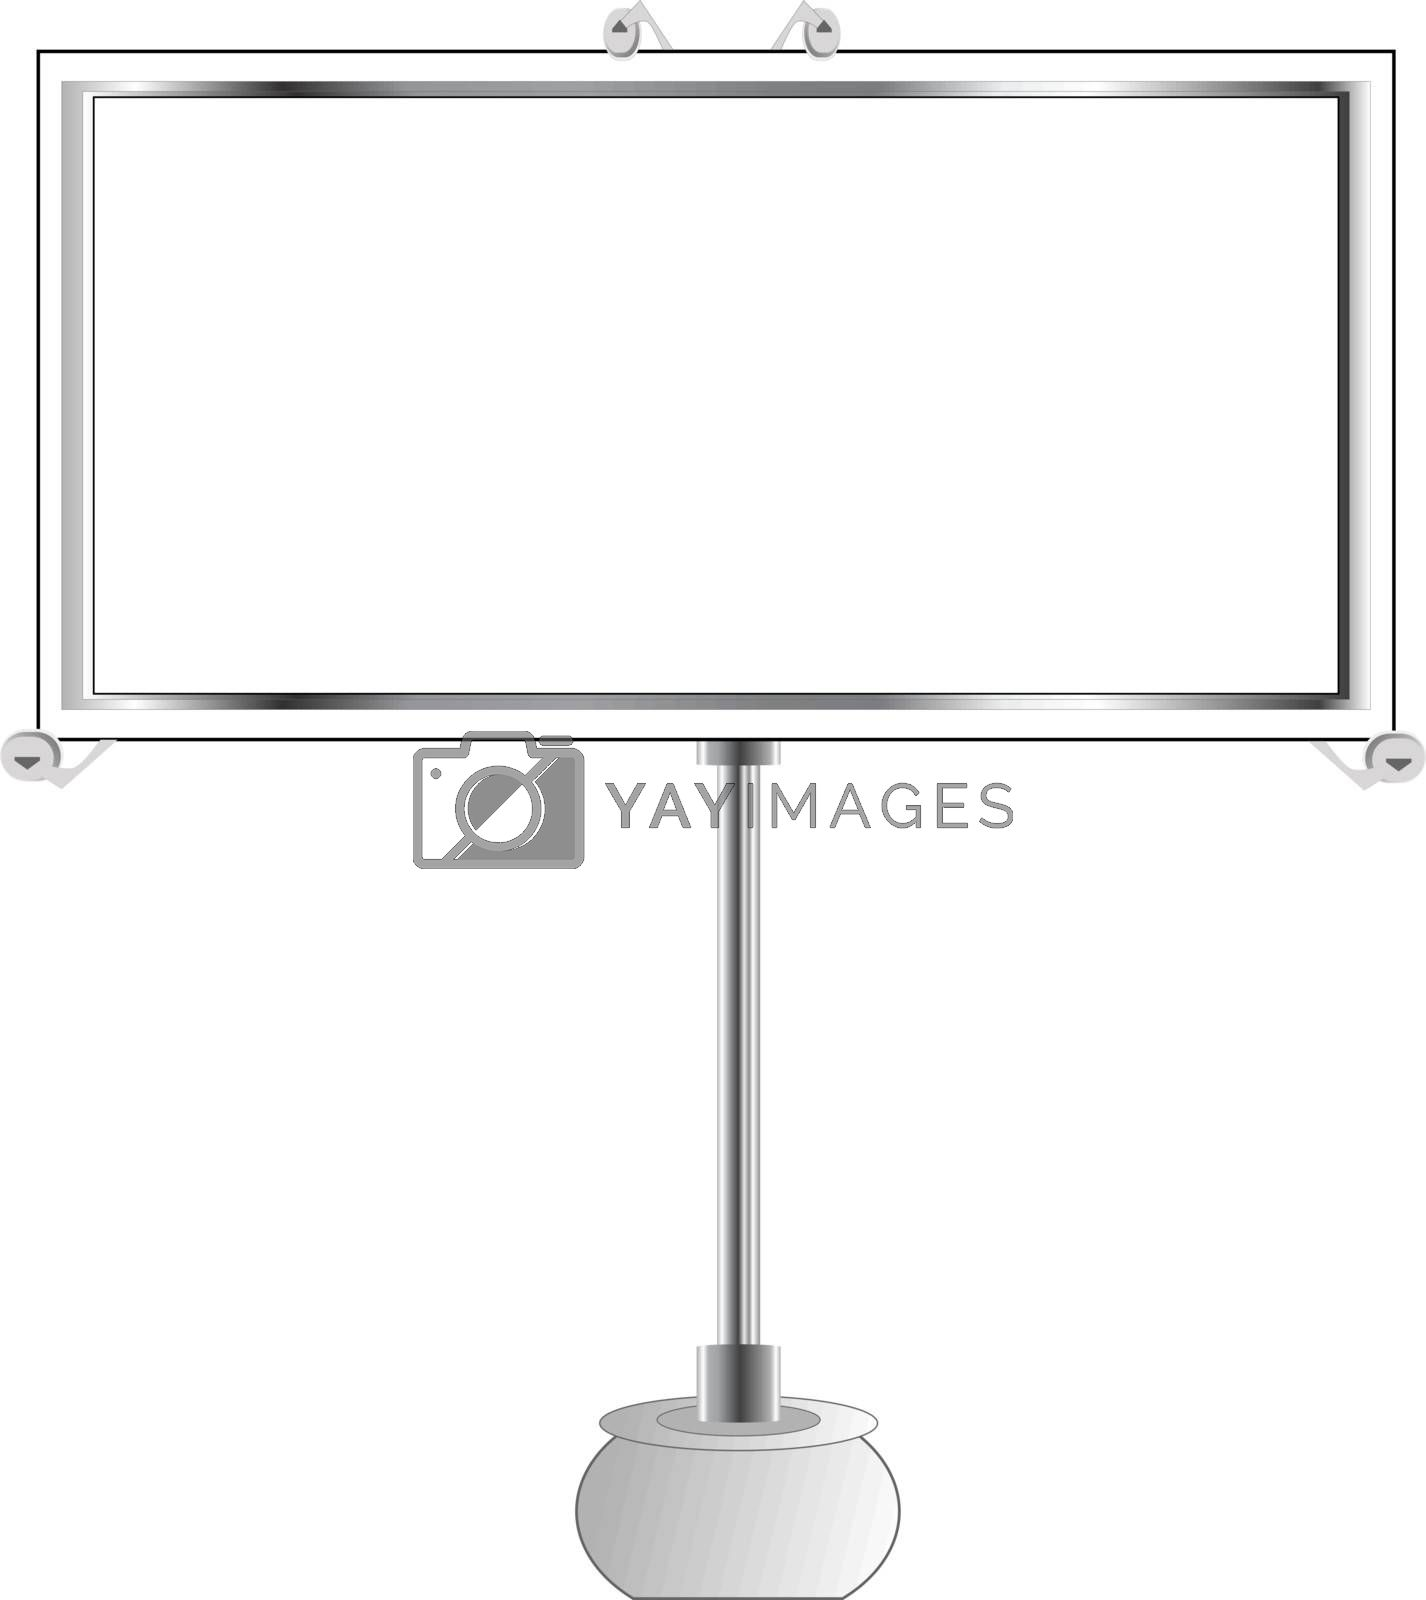 Advertise billboard. Vector